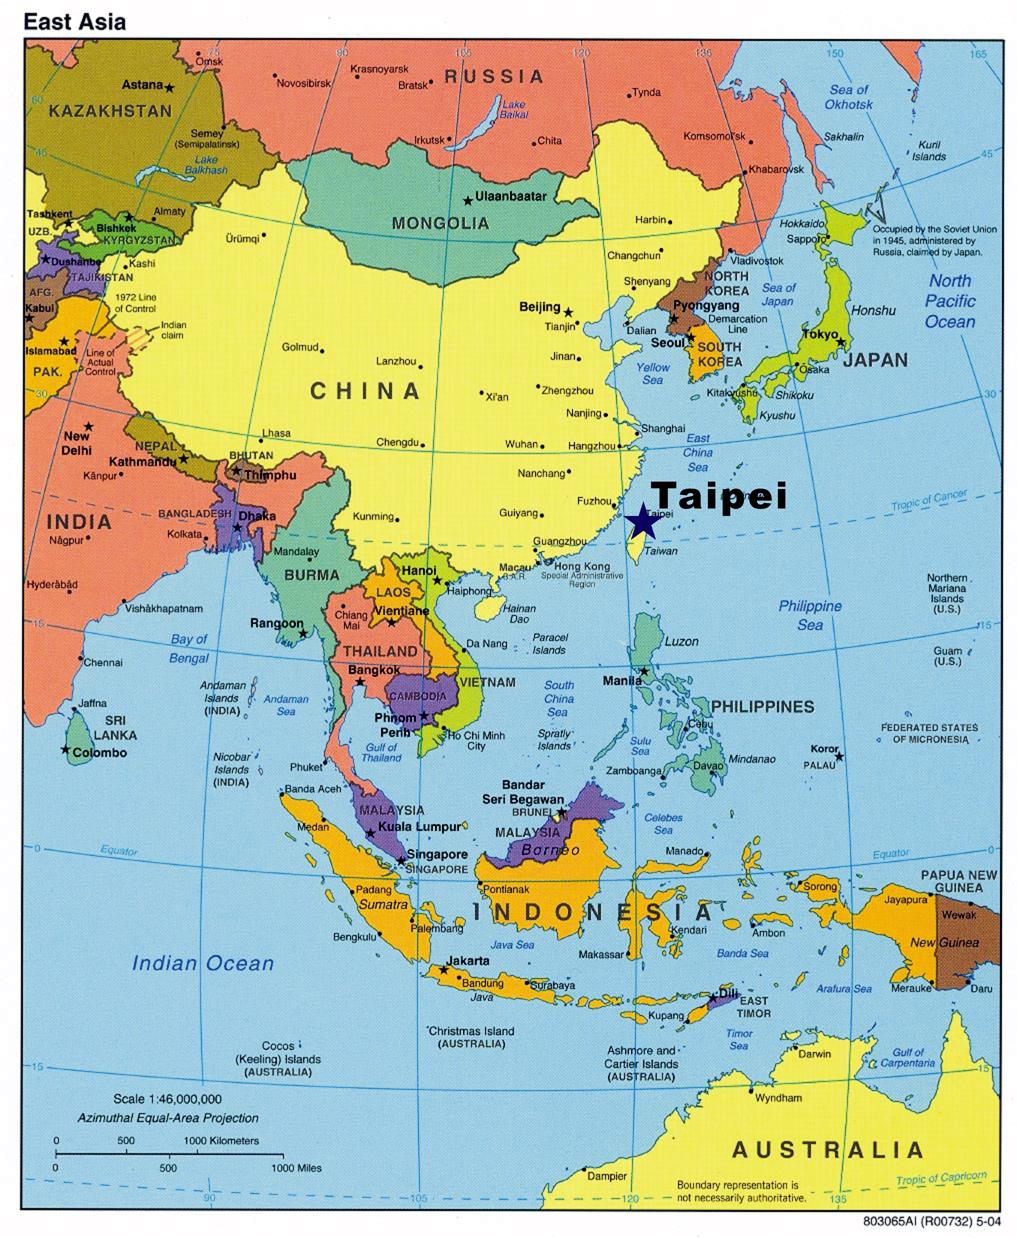 FileTaipei in East Asiajpg